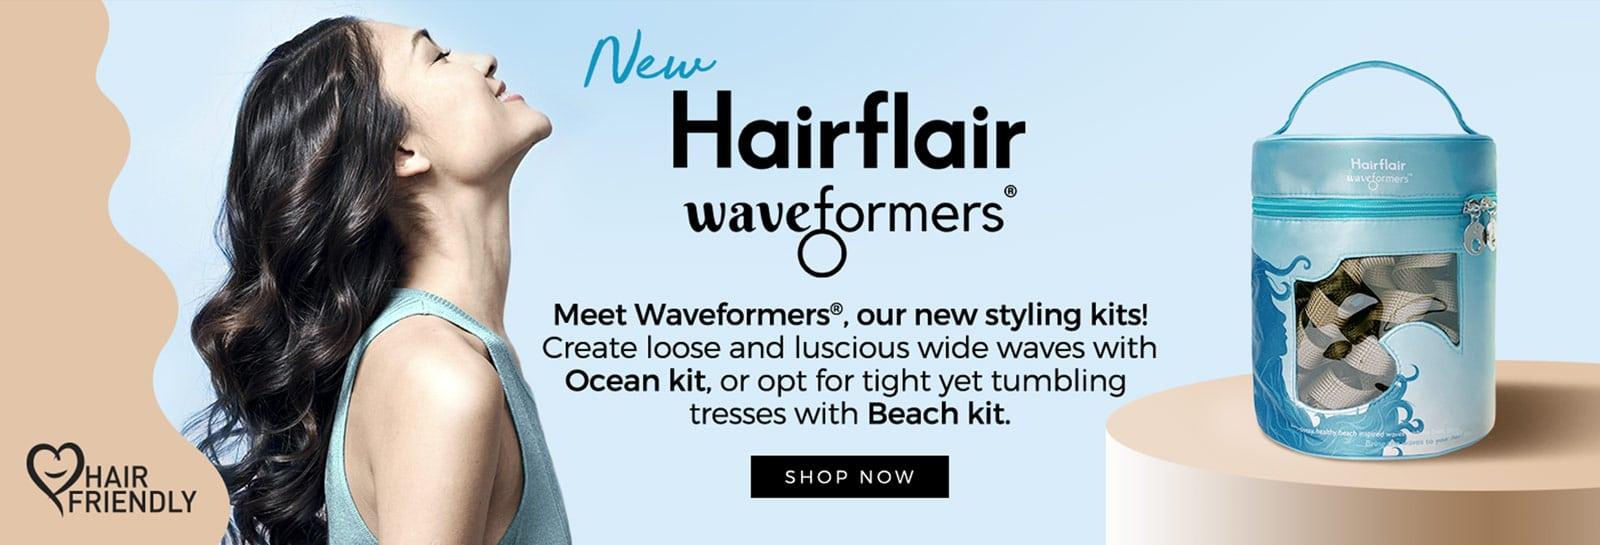 Waveformers